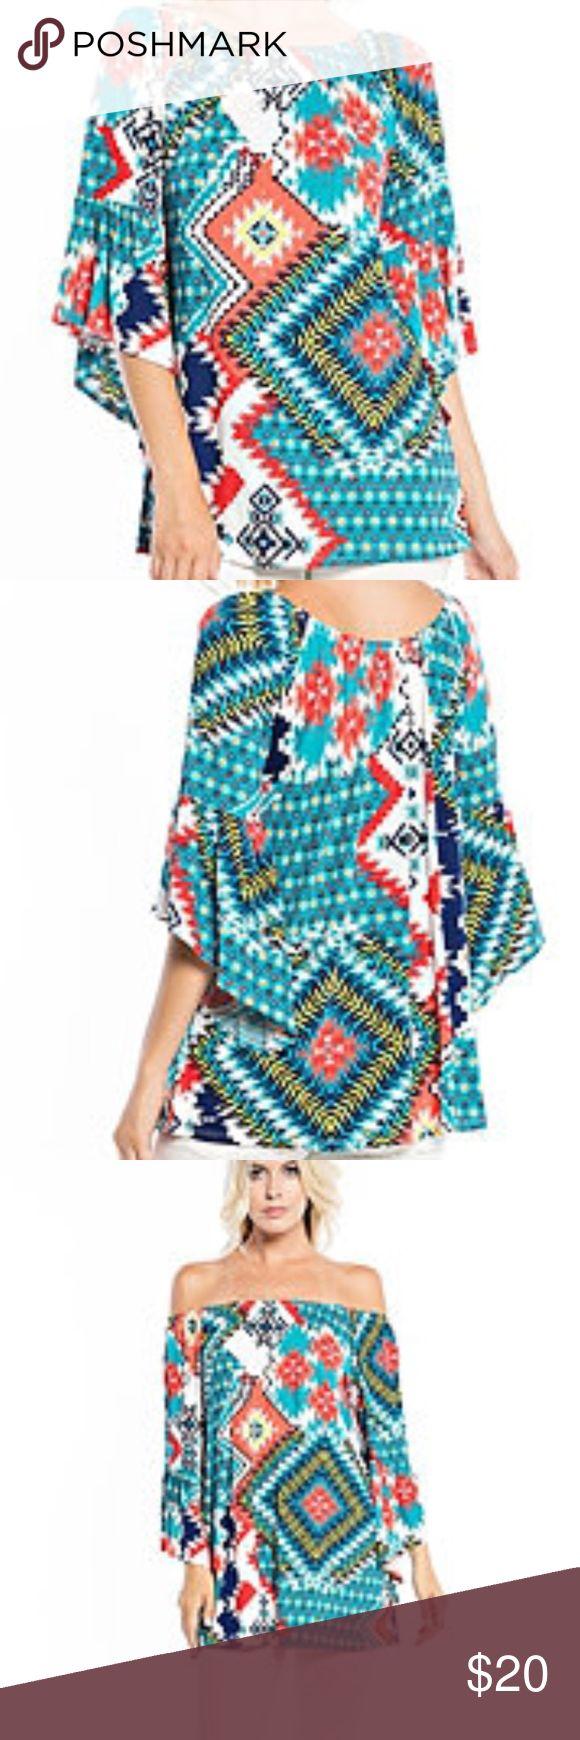 Best 25+ Plus size shirt dress ideas on Pinterest | Curvy fashion ...